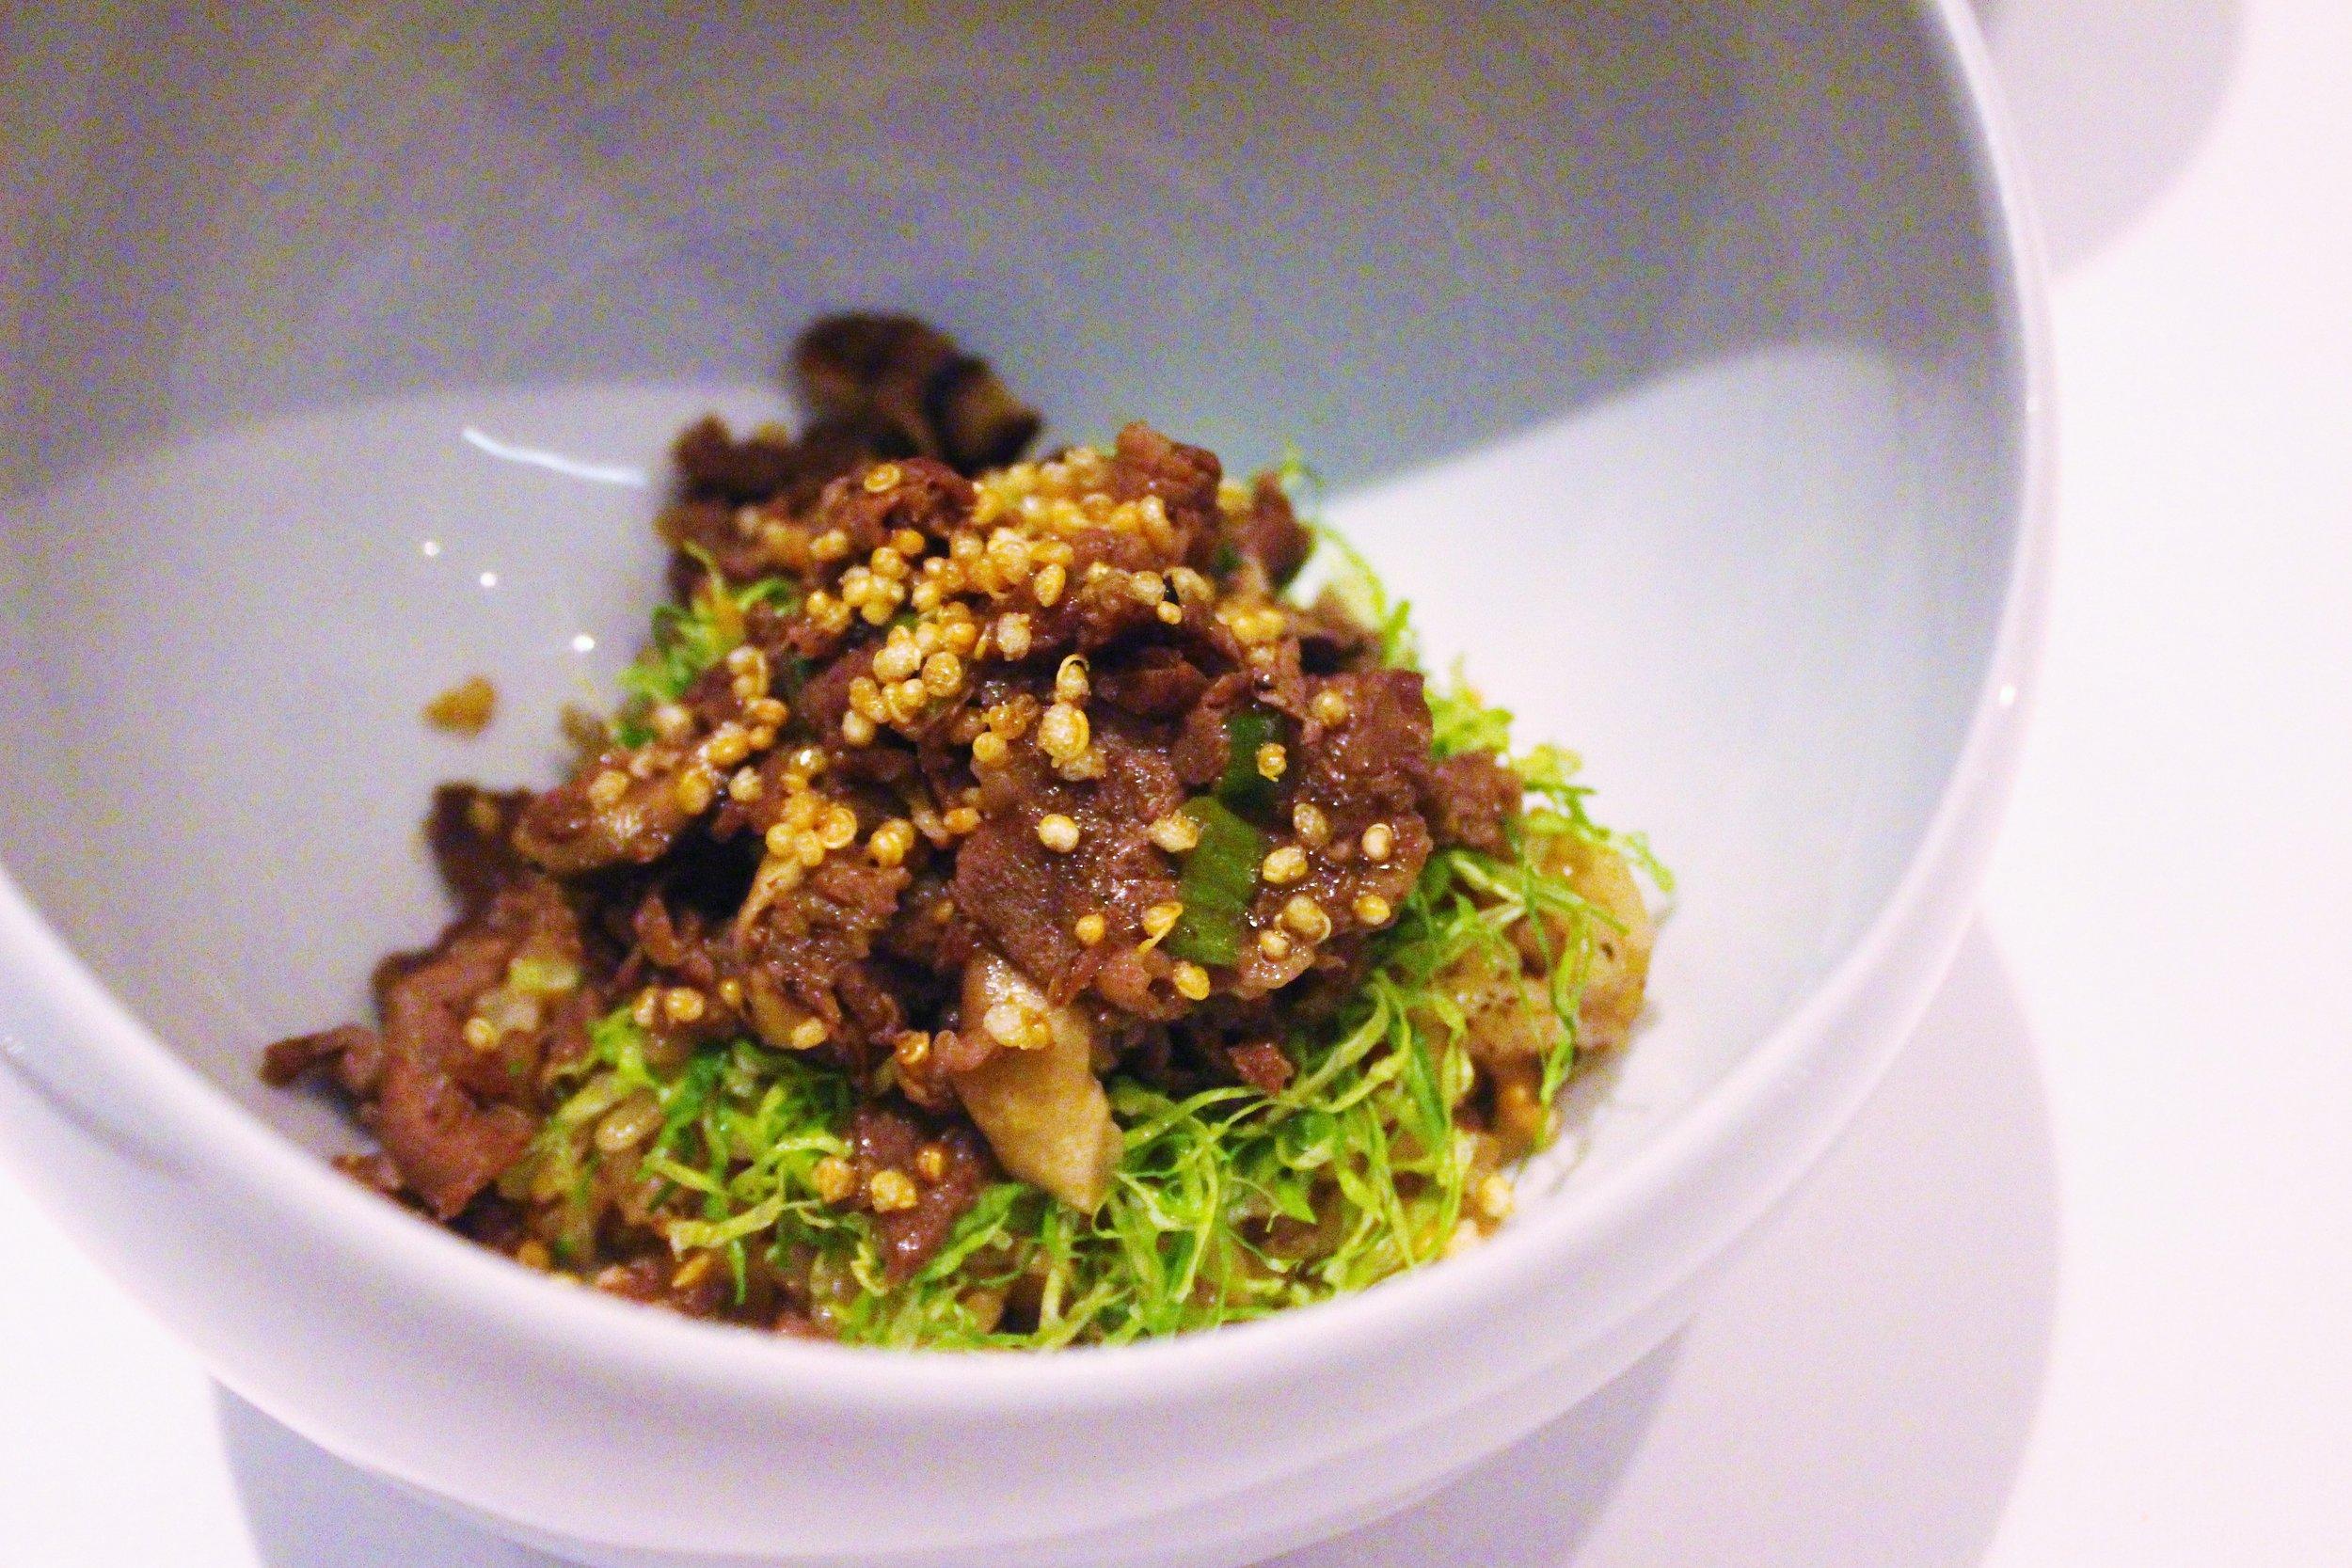 Truffle Bulgogi with White Truffle Pate and Wild Sesame at Jungsik